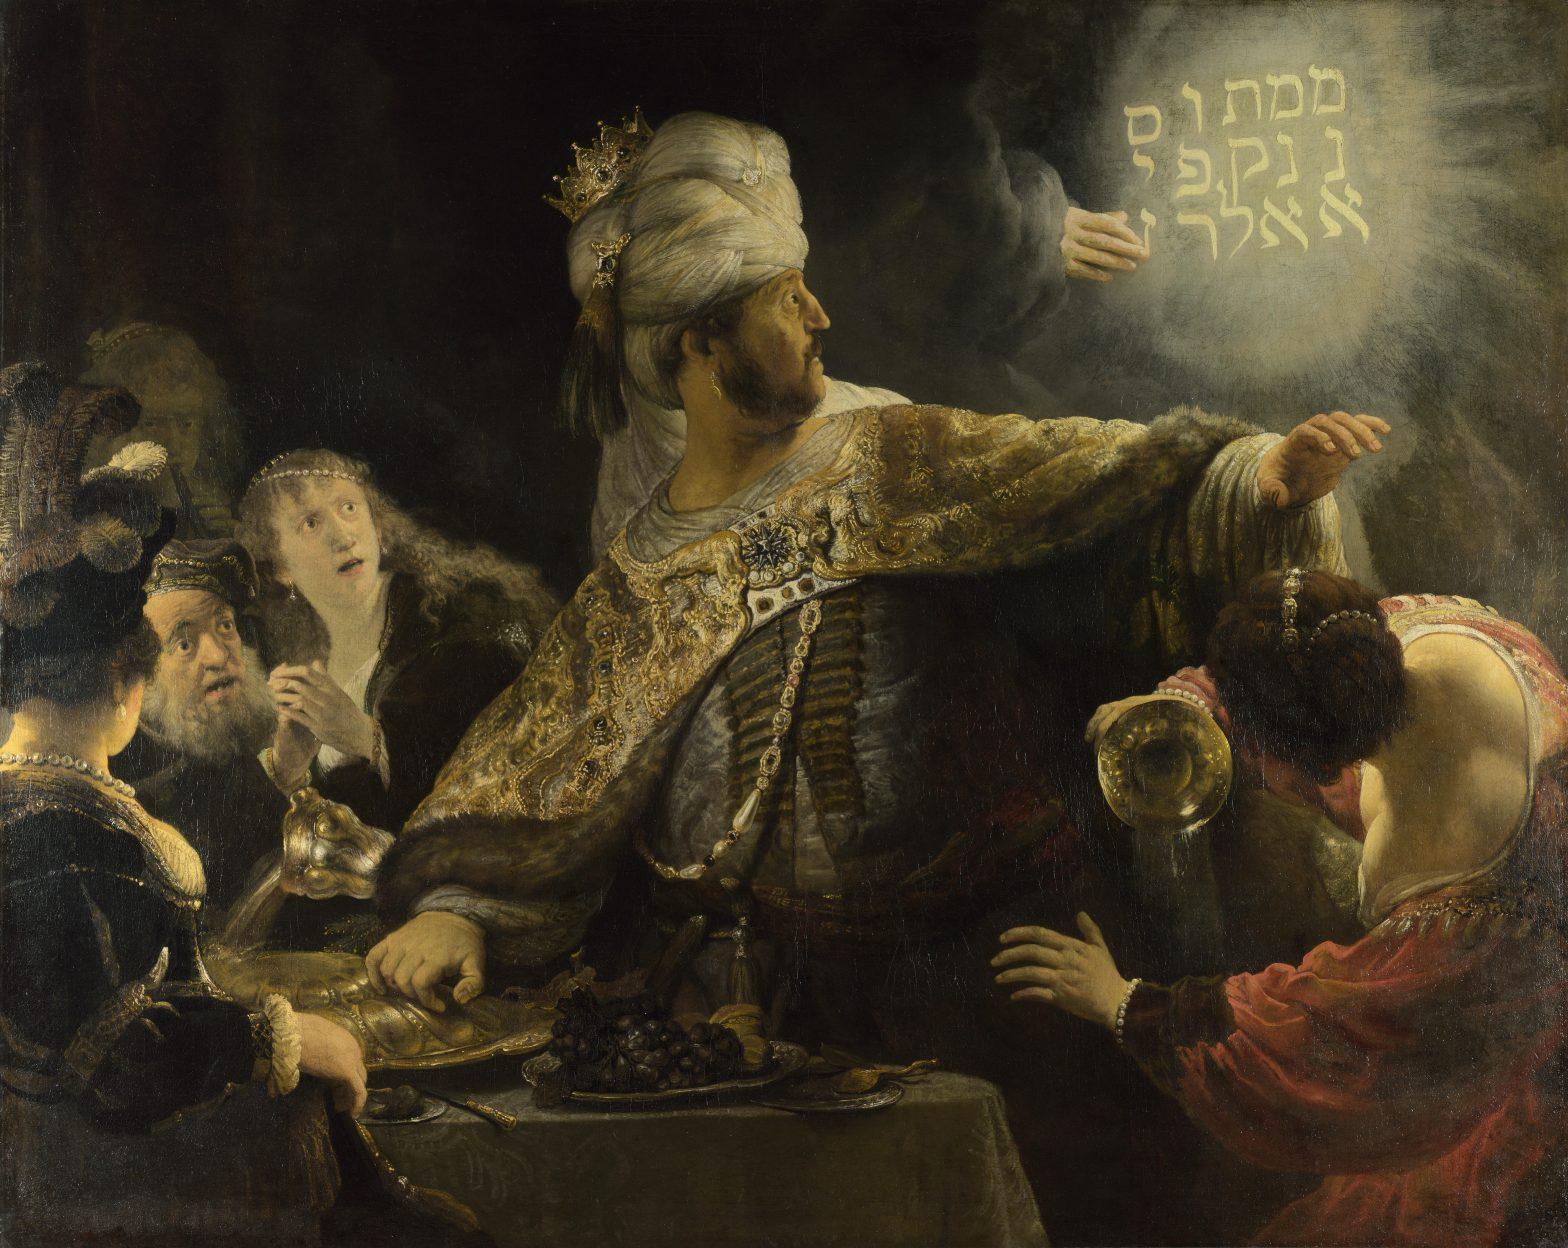 La Nebuchadnezzar